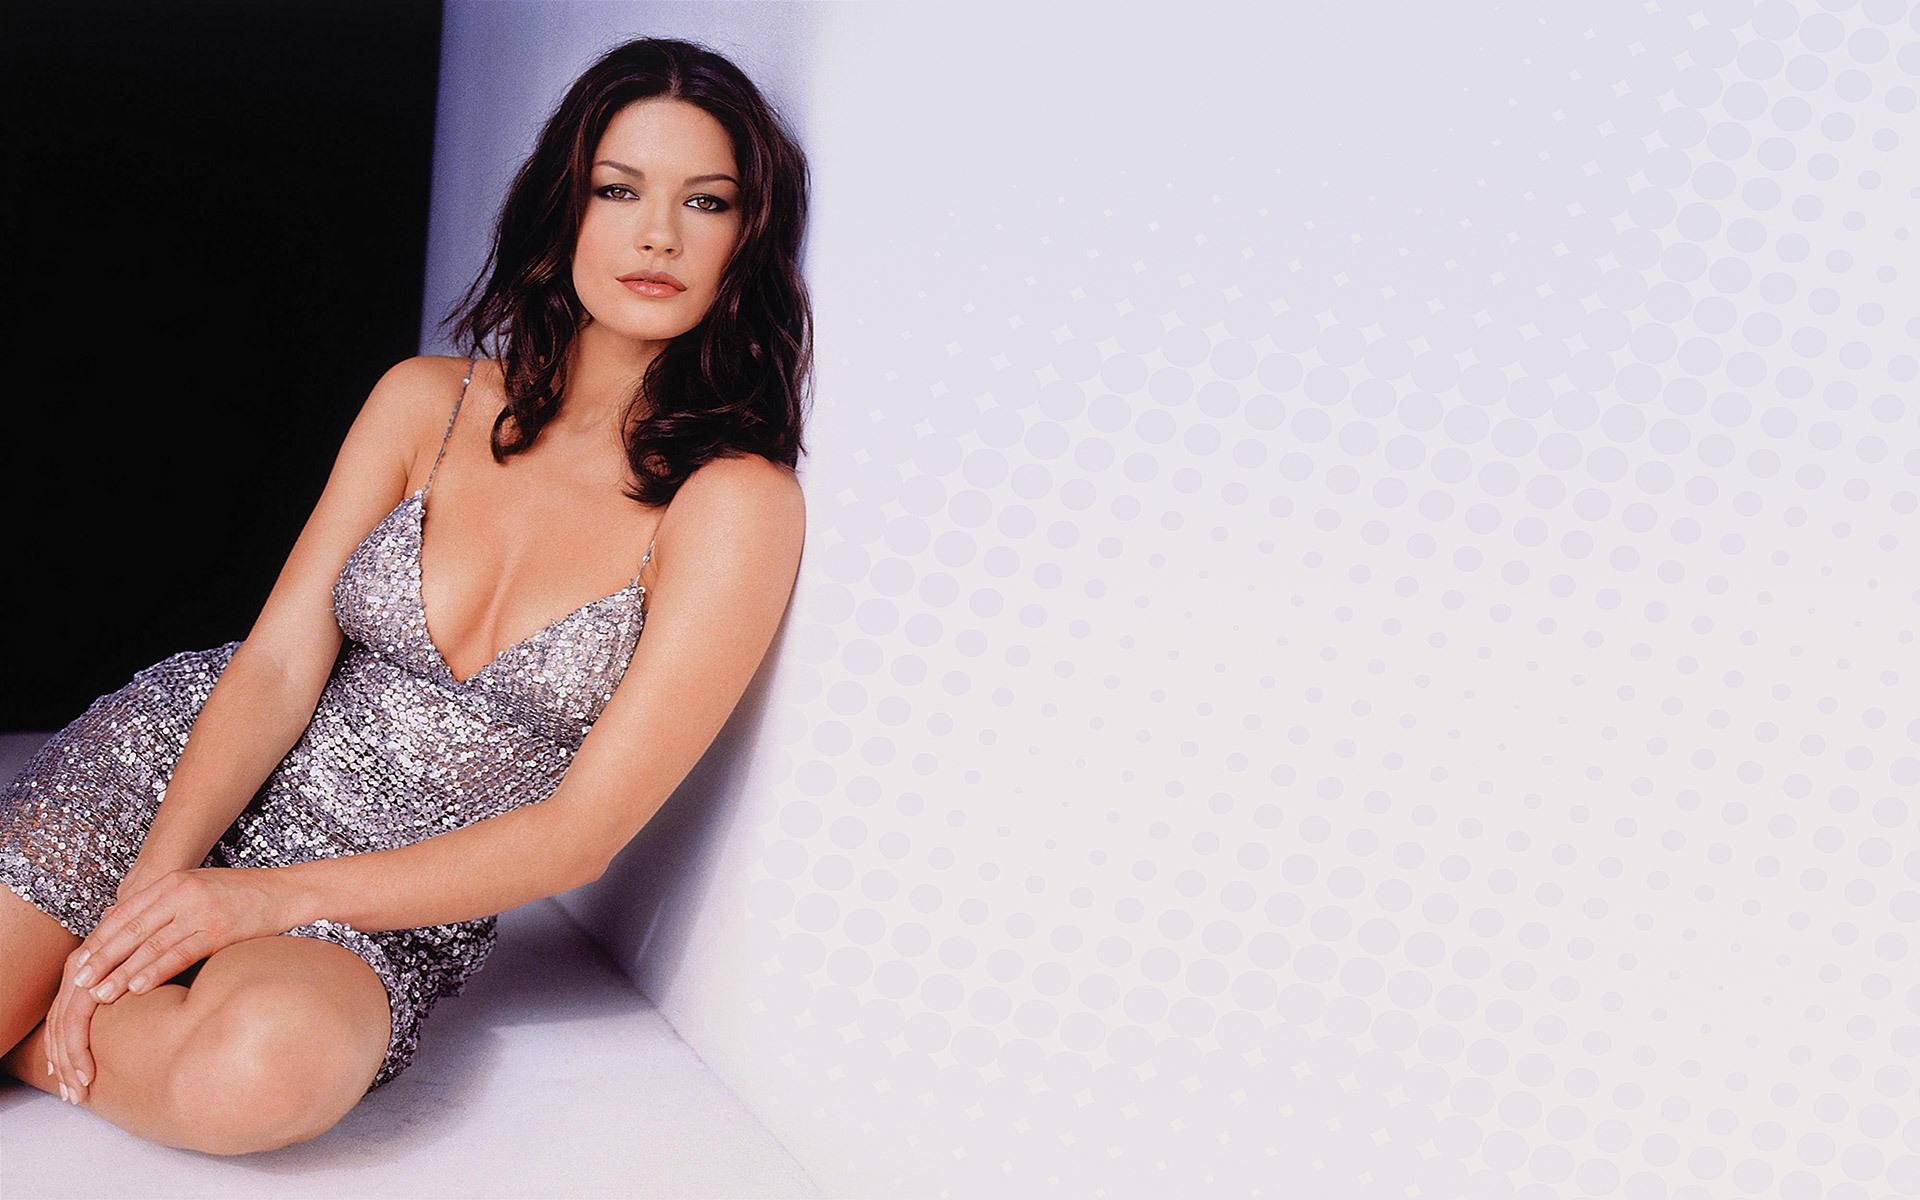 47679 download wallpaper Girls, People, Catherine Zeta-Jones screensavers and pictures for free